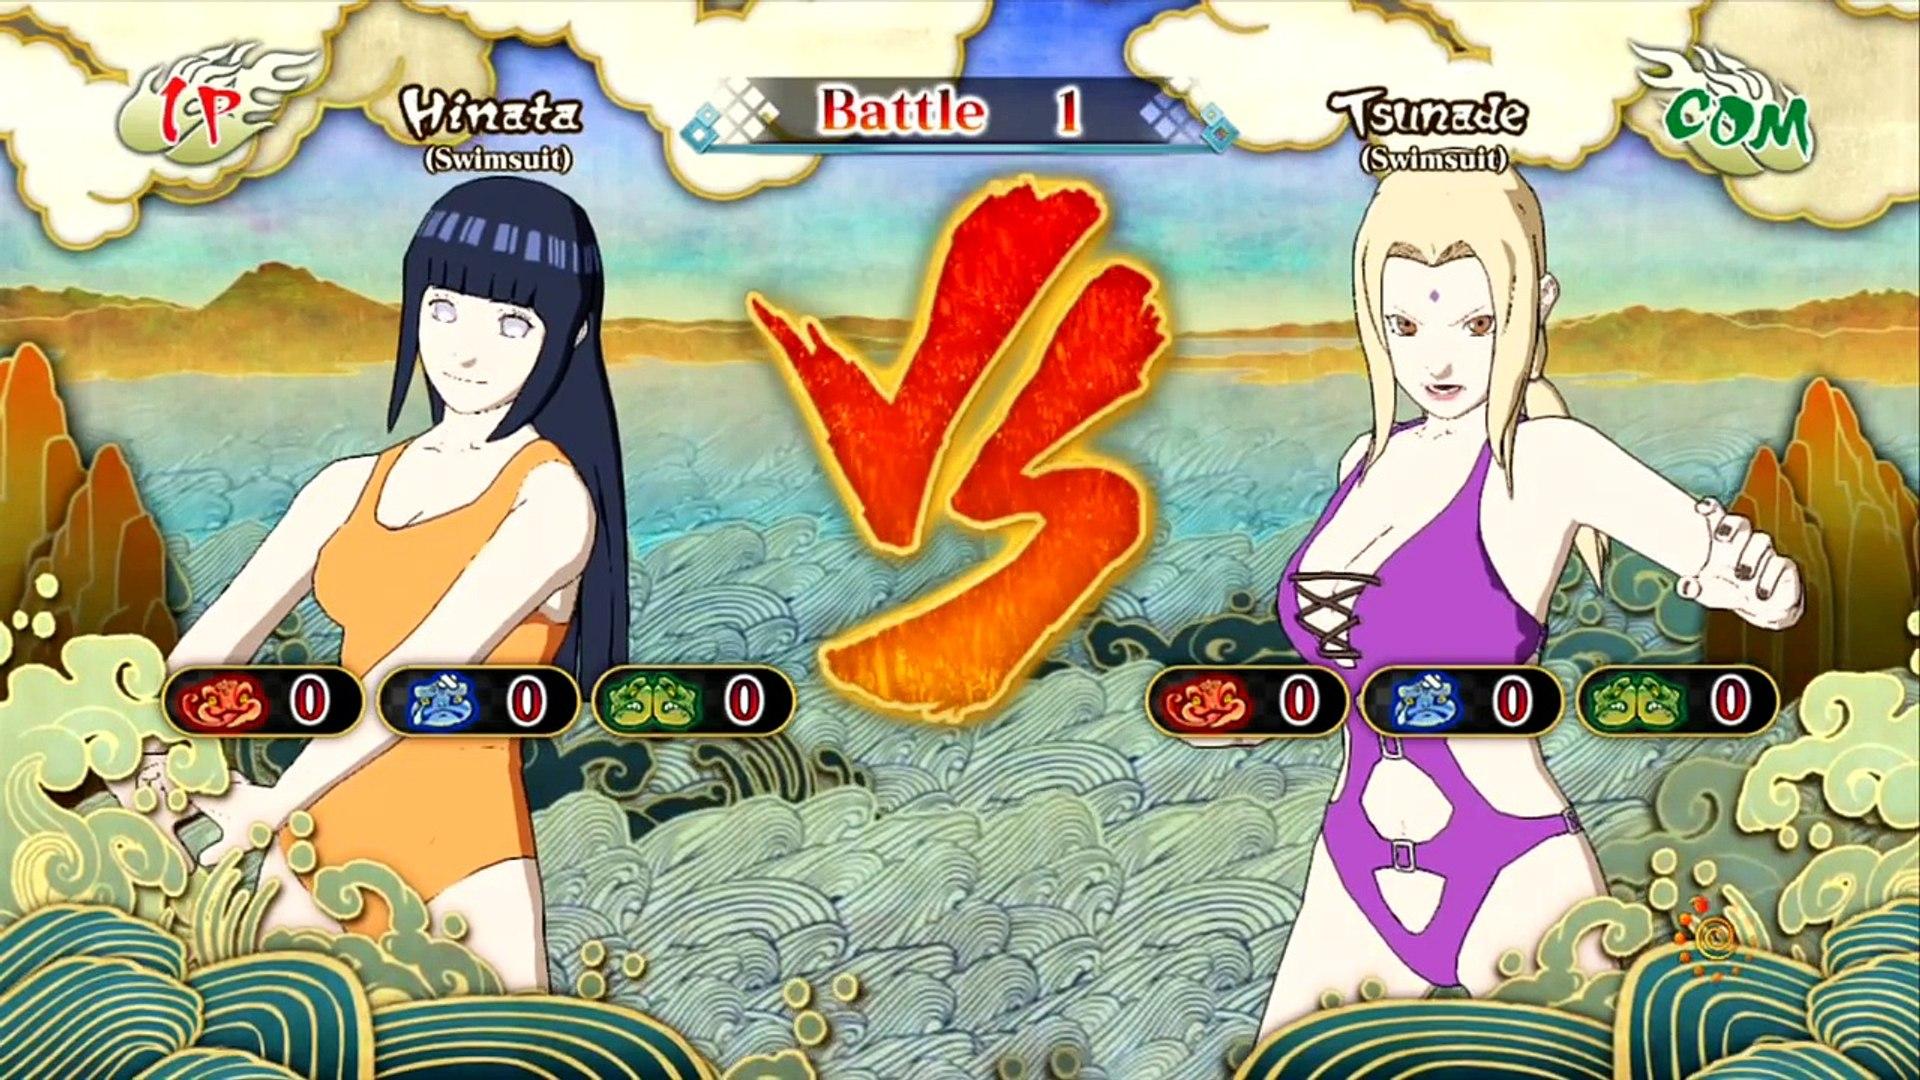 Naruto Shippuden Ultimate Ninja Storm 3 swimsuit pack DLC